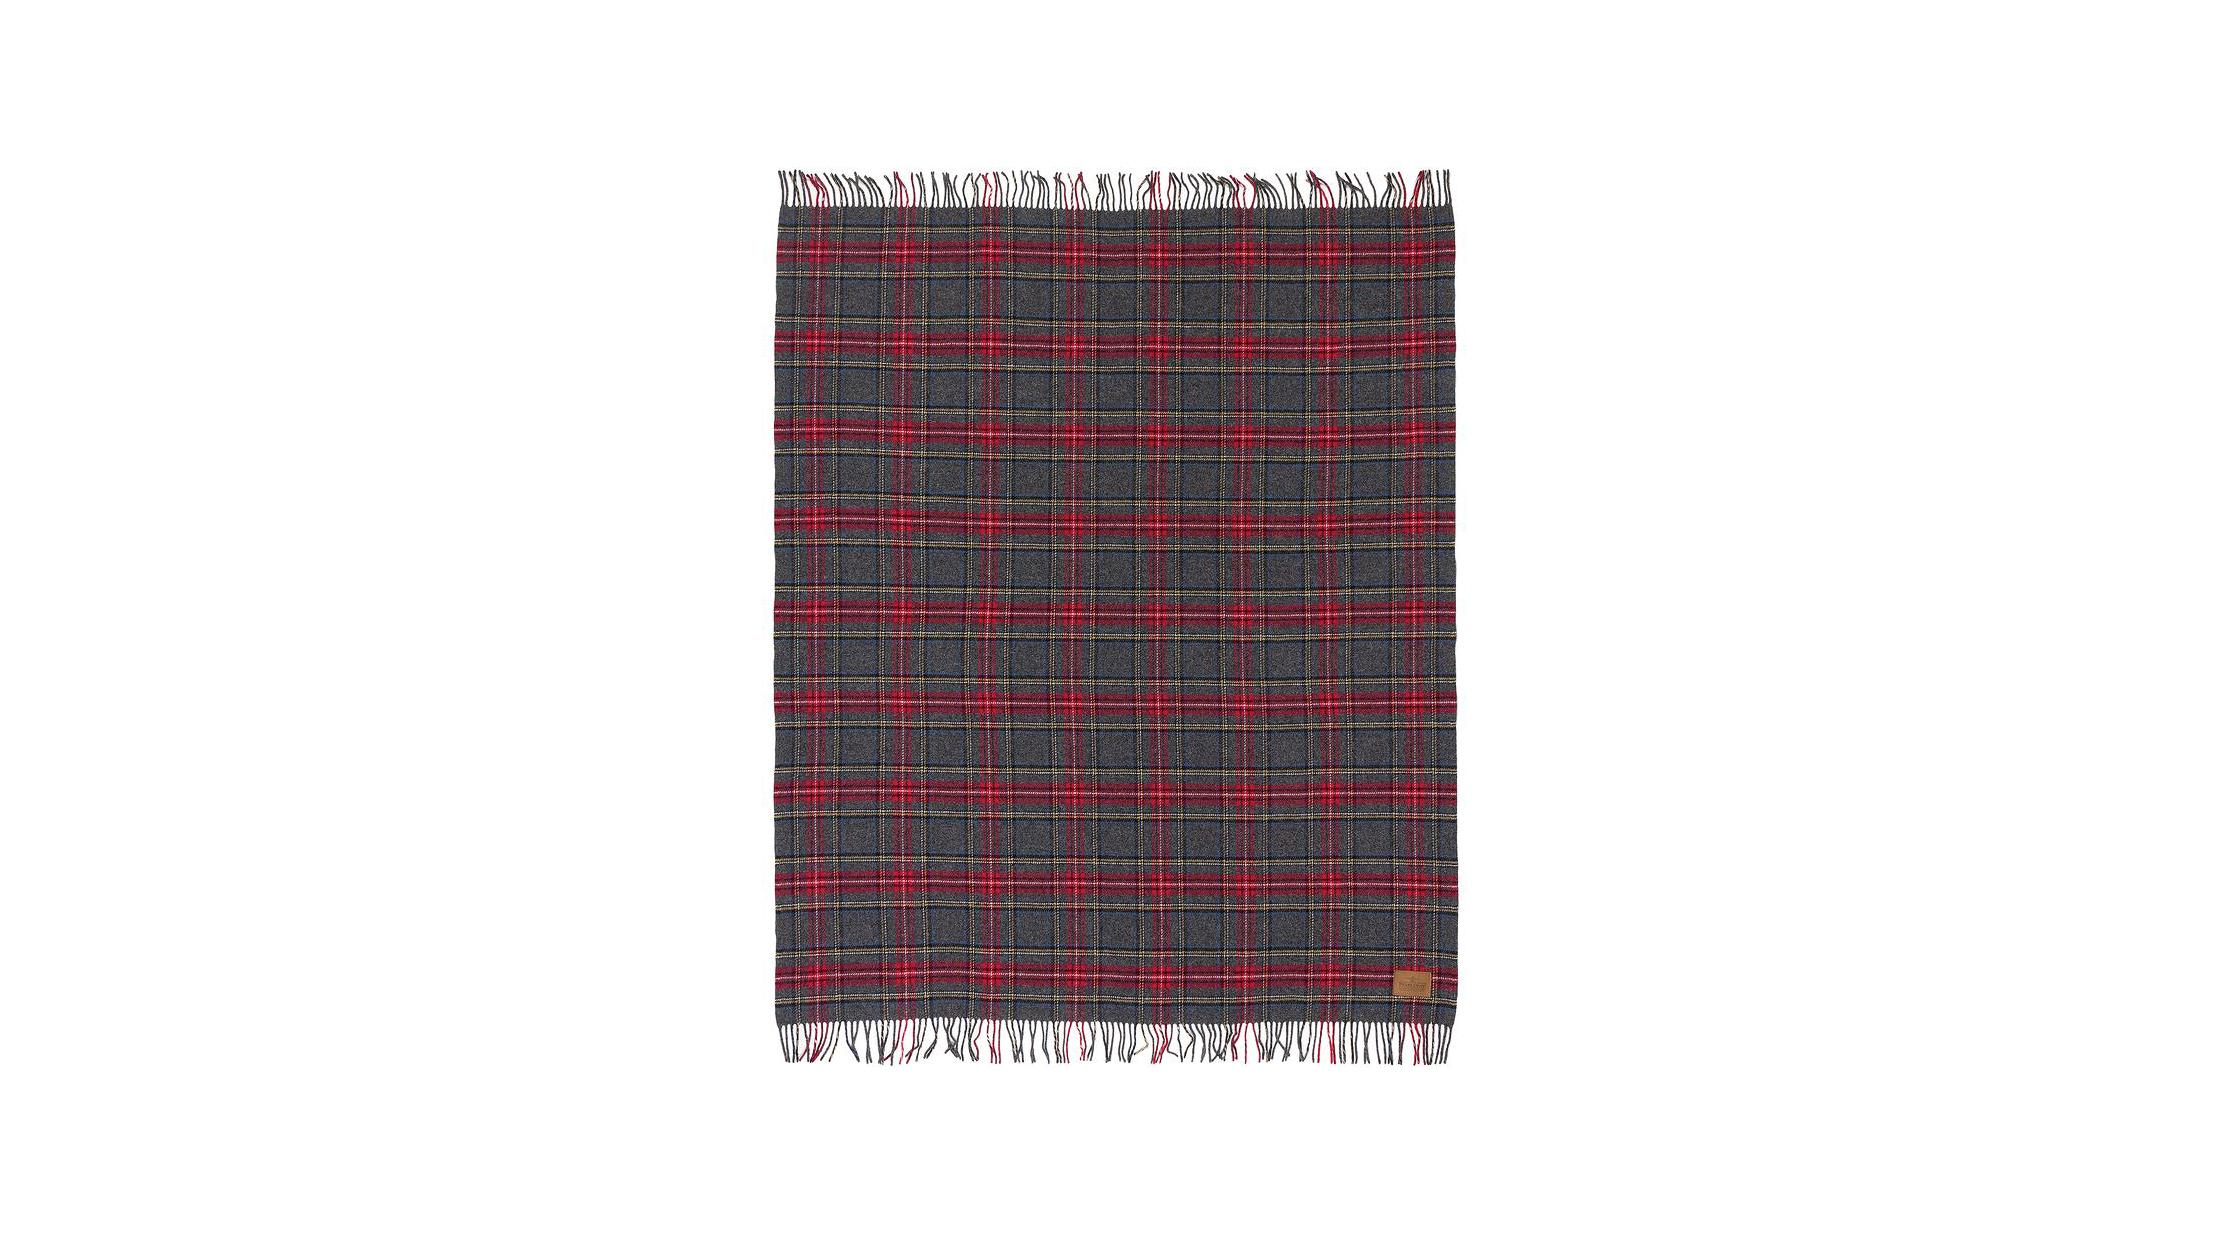 wool anniversary gift red plaid blanket